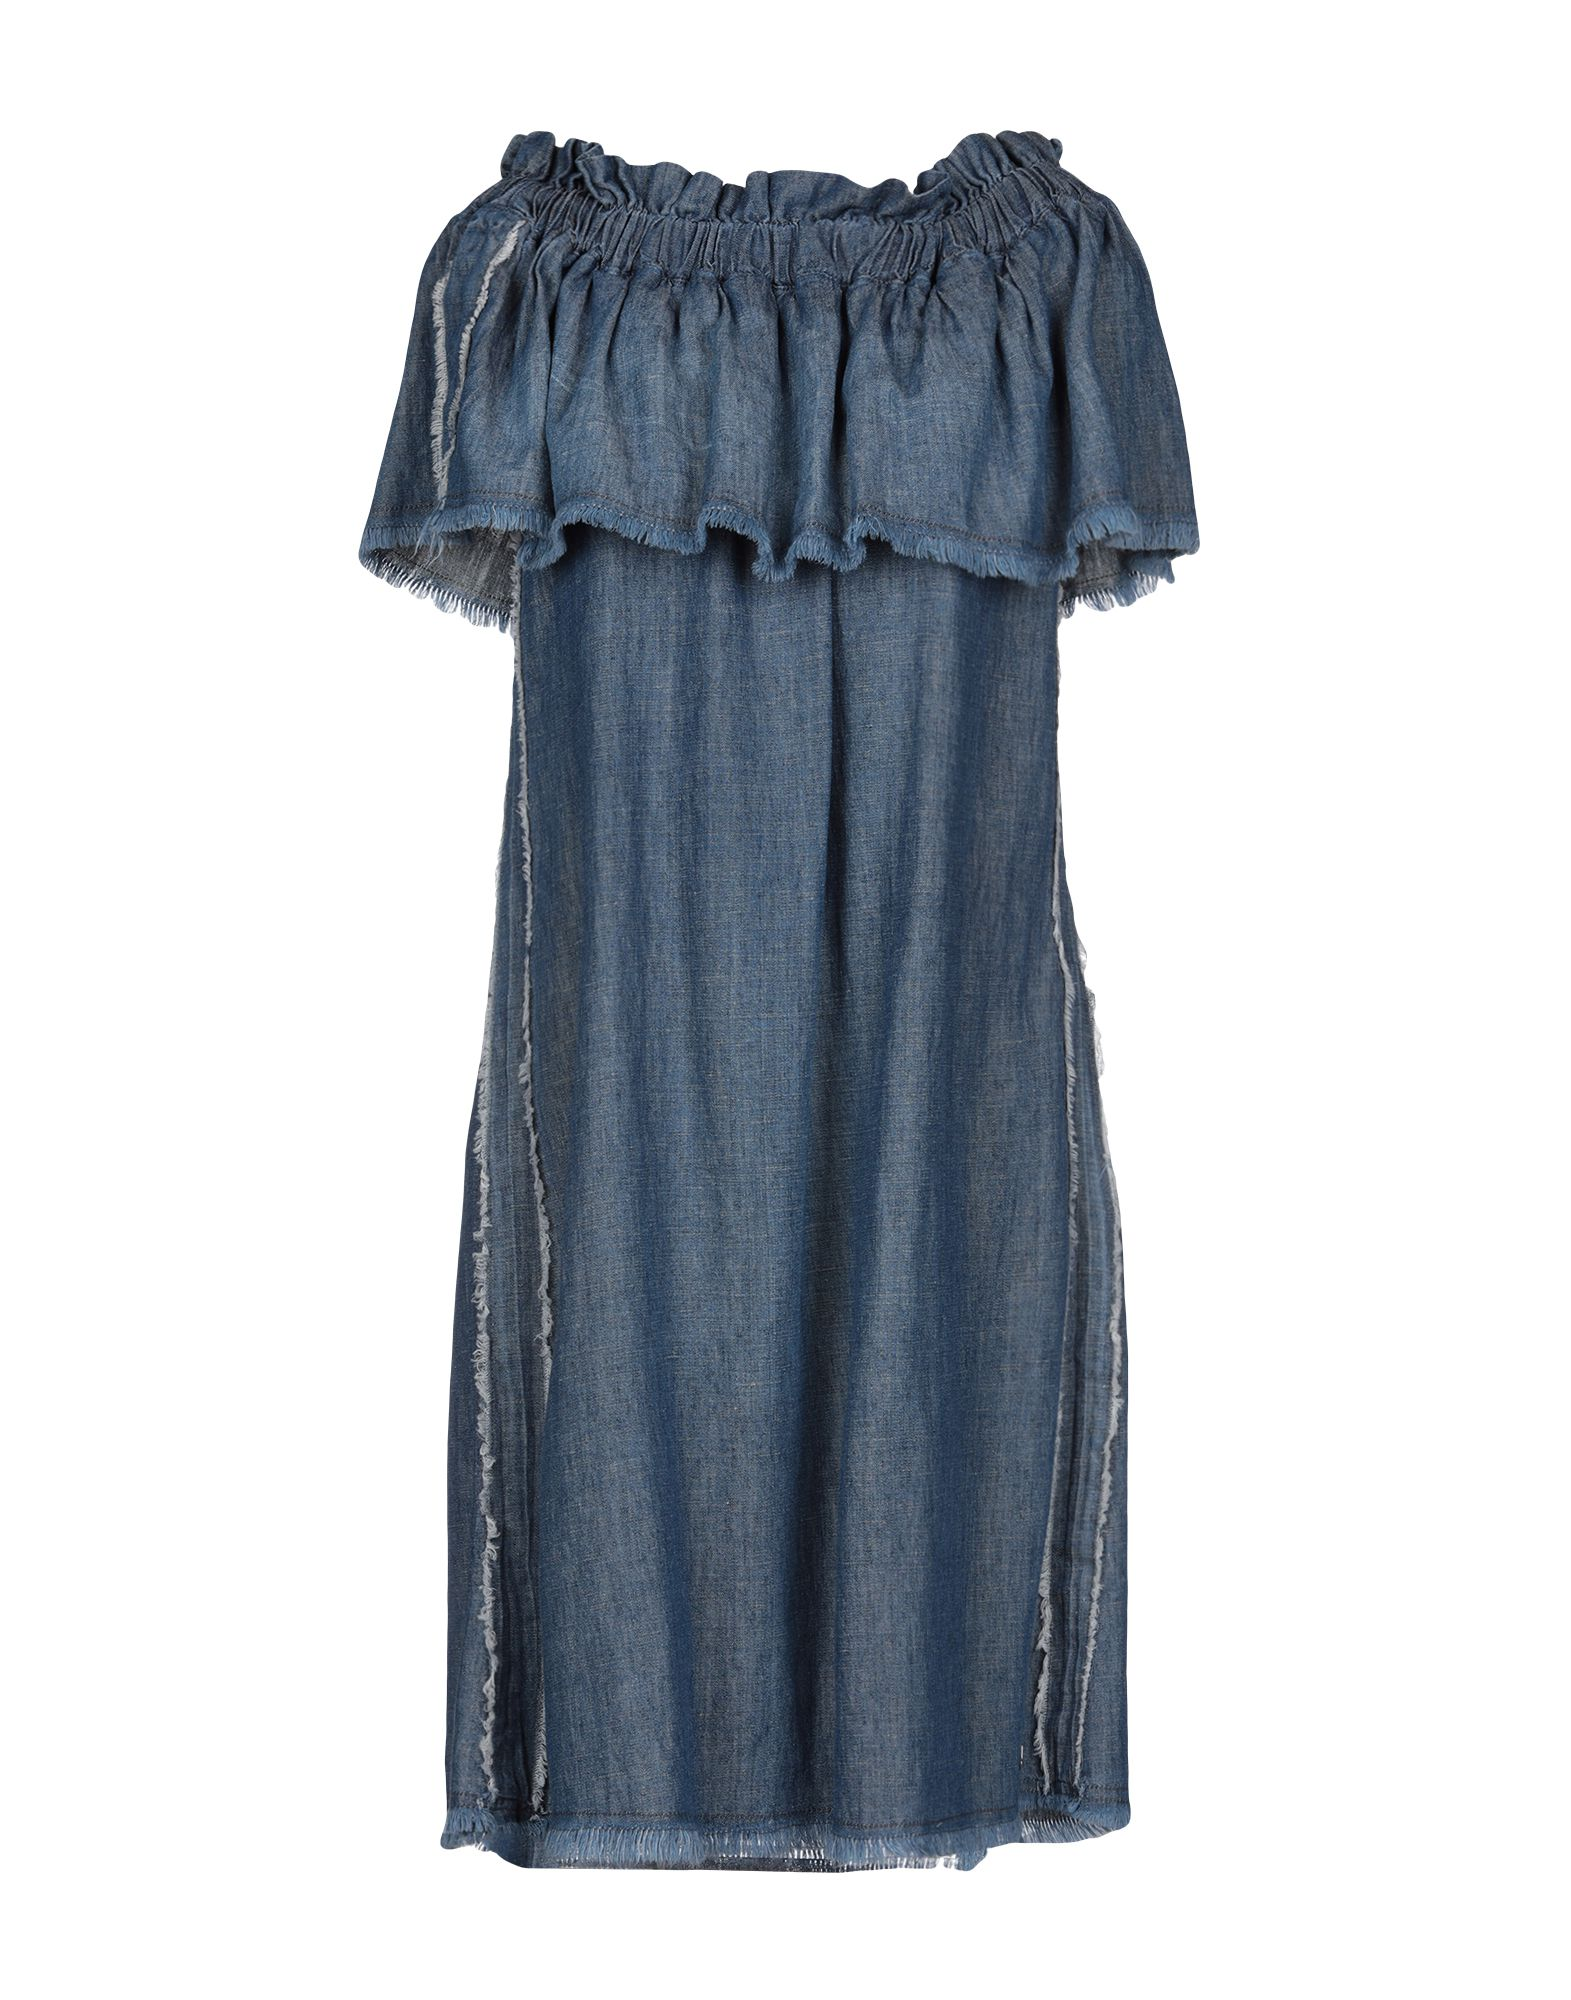 Фото - ROŸ ROGER'S Платье до колена alice san diego платье до колена